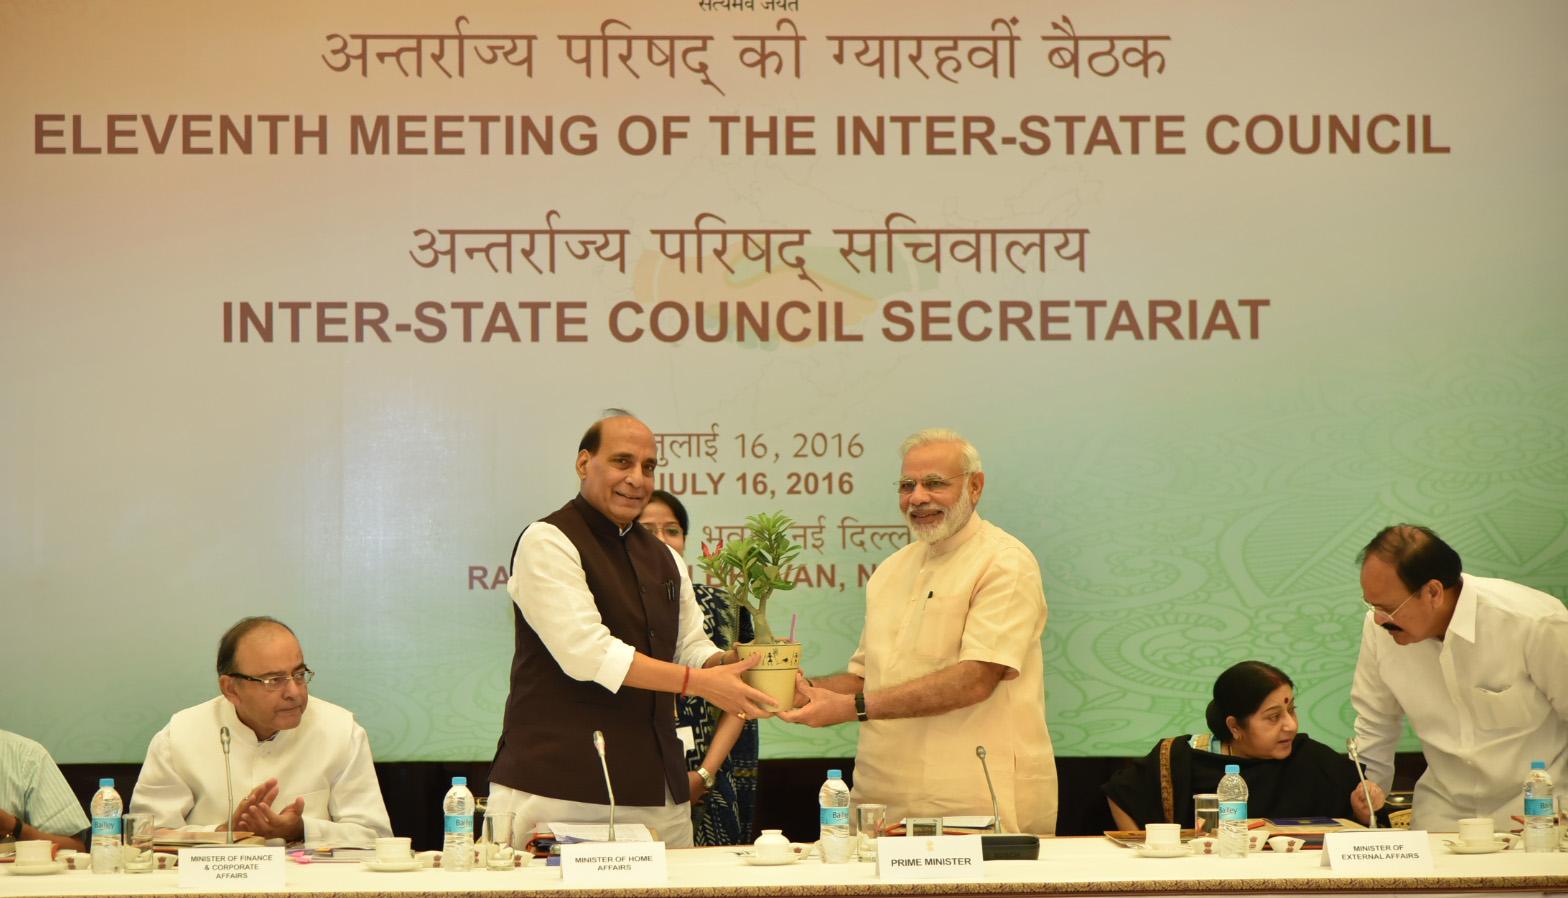 The Union Home Minister, Shri Rajnath Singh presenting a Bonsai plant to Prime Minister, Shri Narendra Modi, at the eleventh Inter-State Council Meeting, in New Delhi on July 16, 2016.